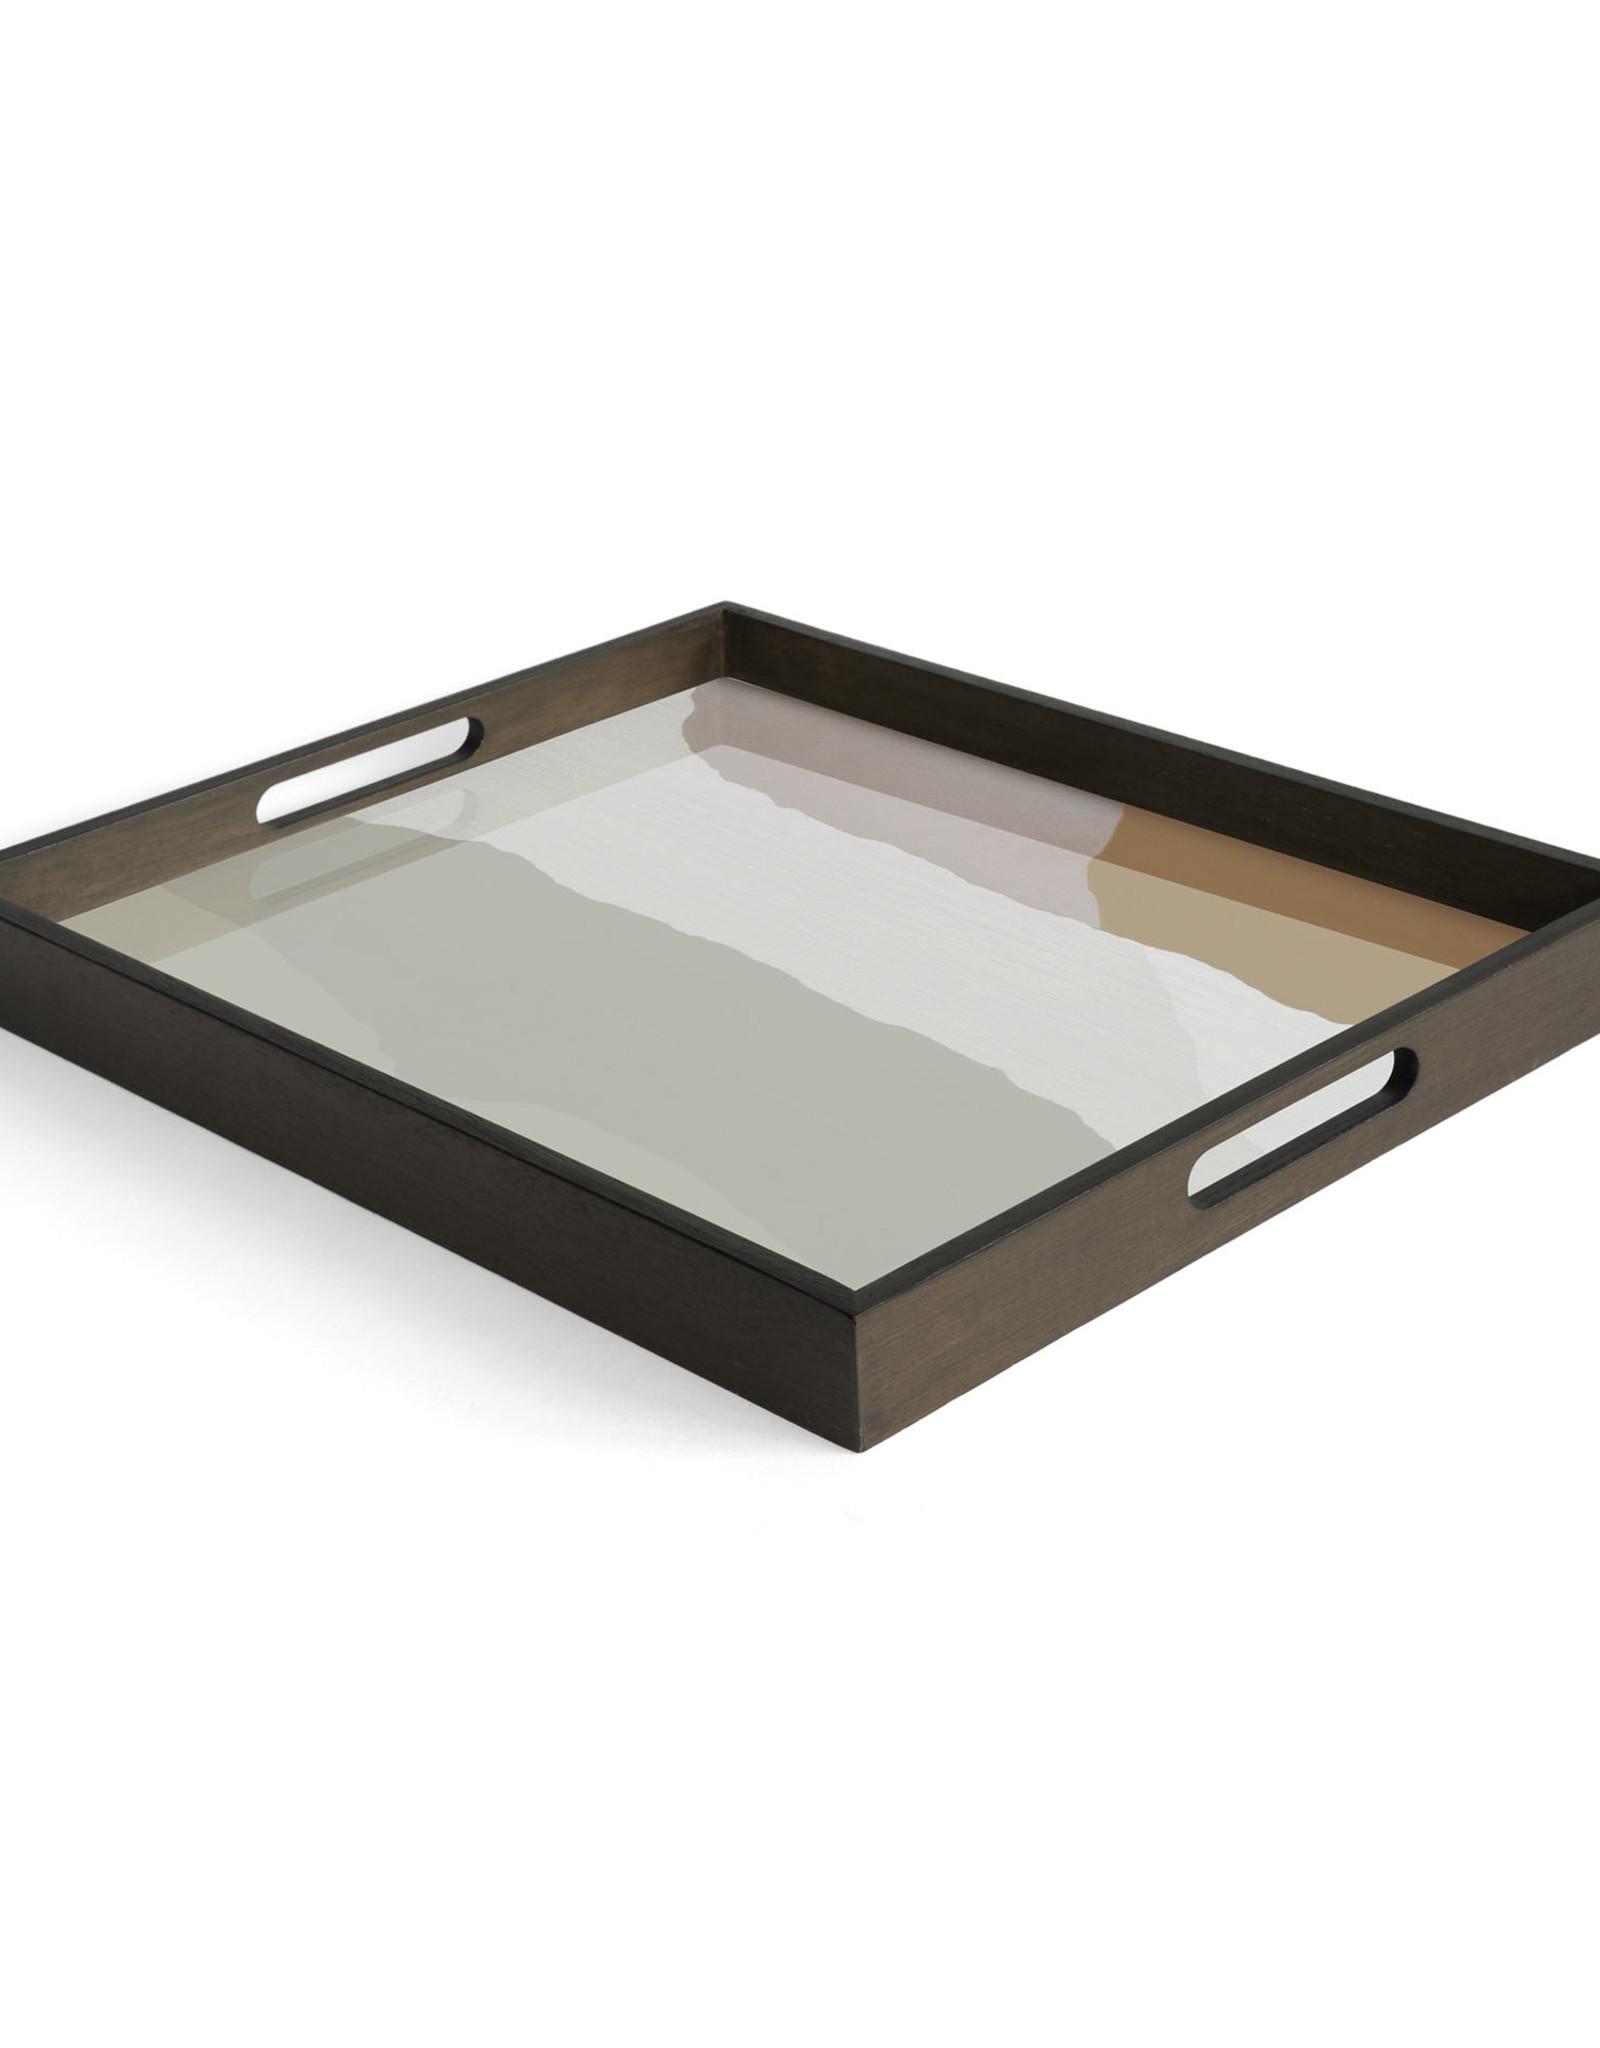 Sand Wabi Sabi glass tray - rectangular - S 18 x 14 x 2